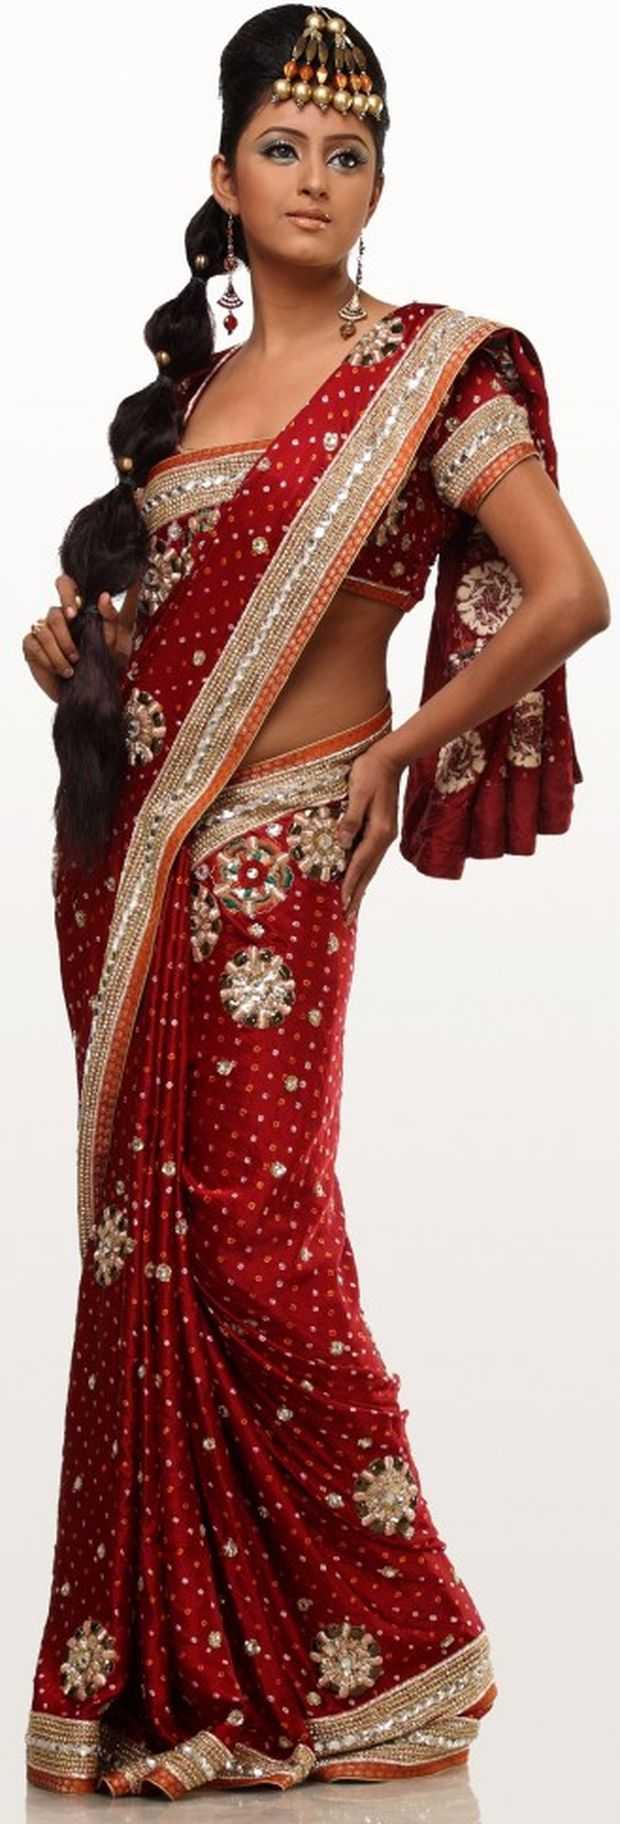 Stylish & Innovative Indian Bridal Saree Designs - Bridal Wear